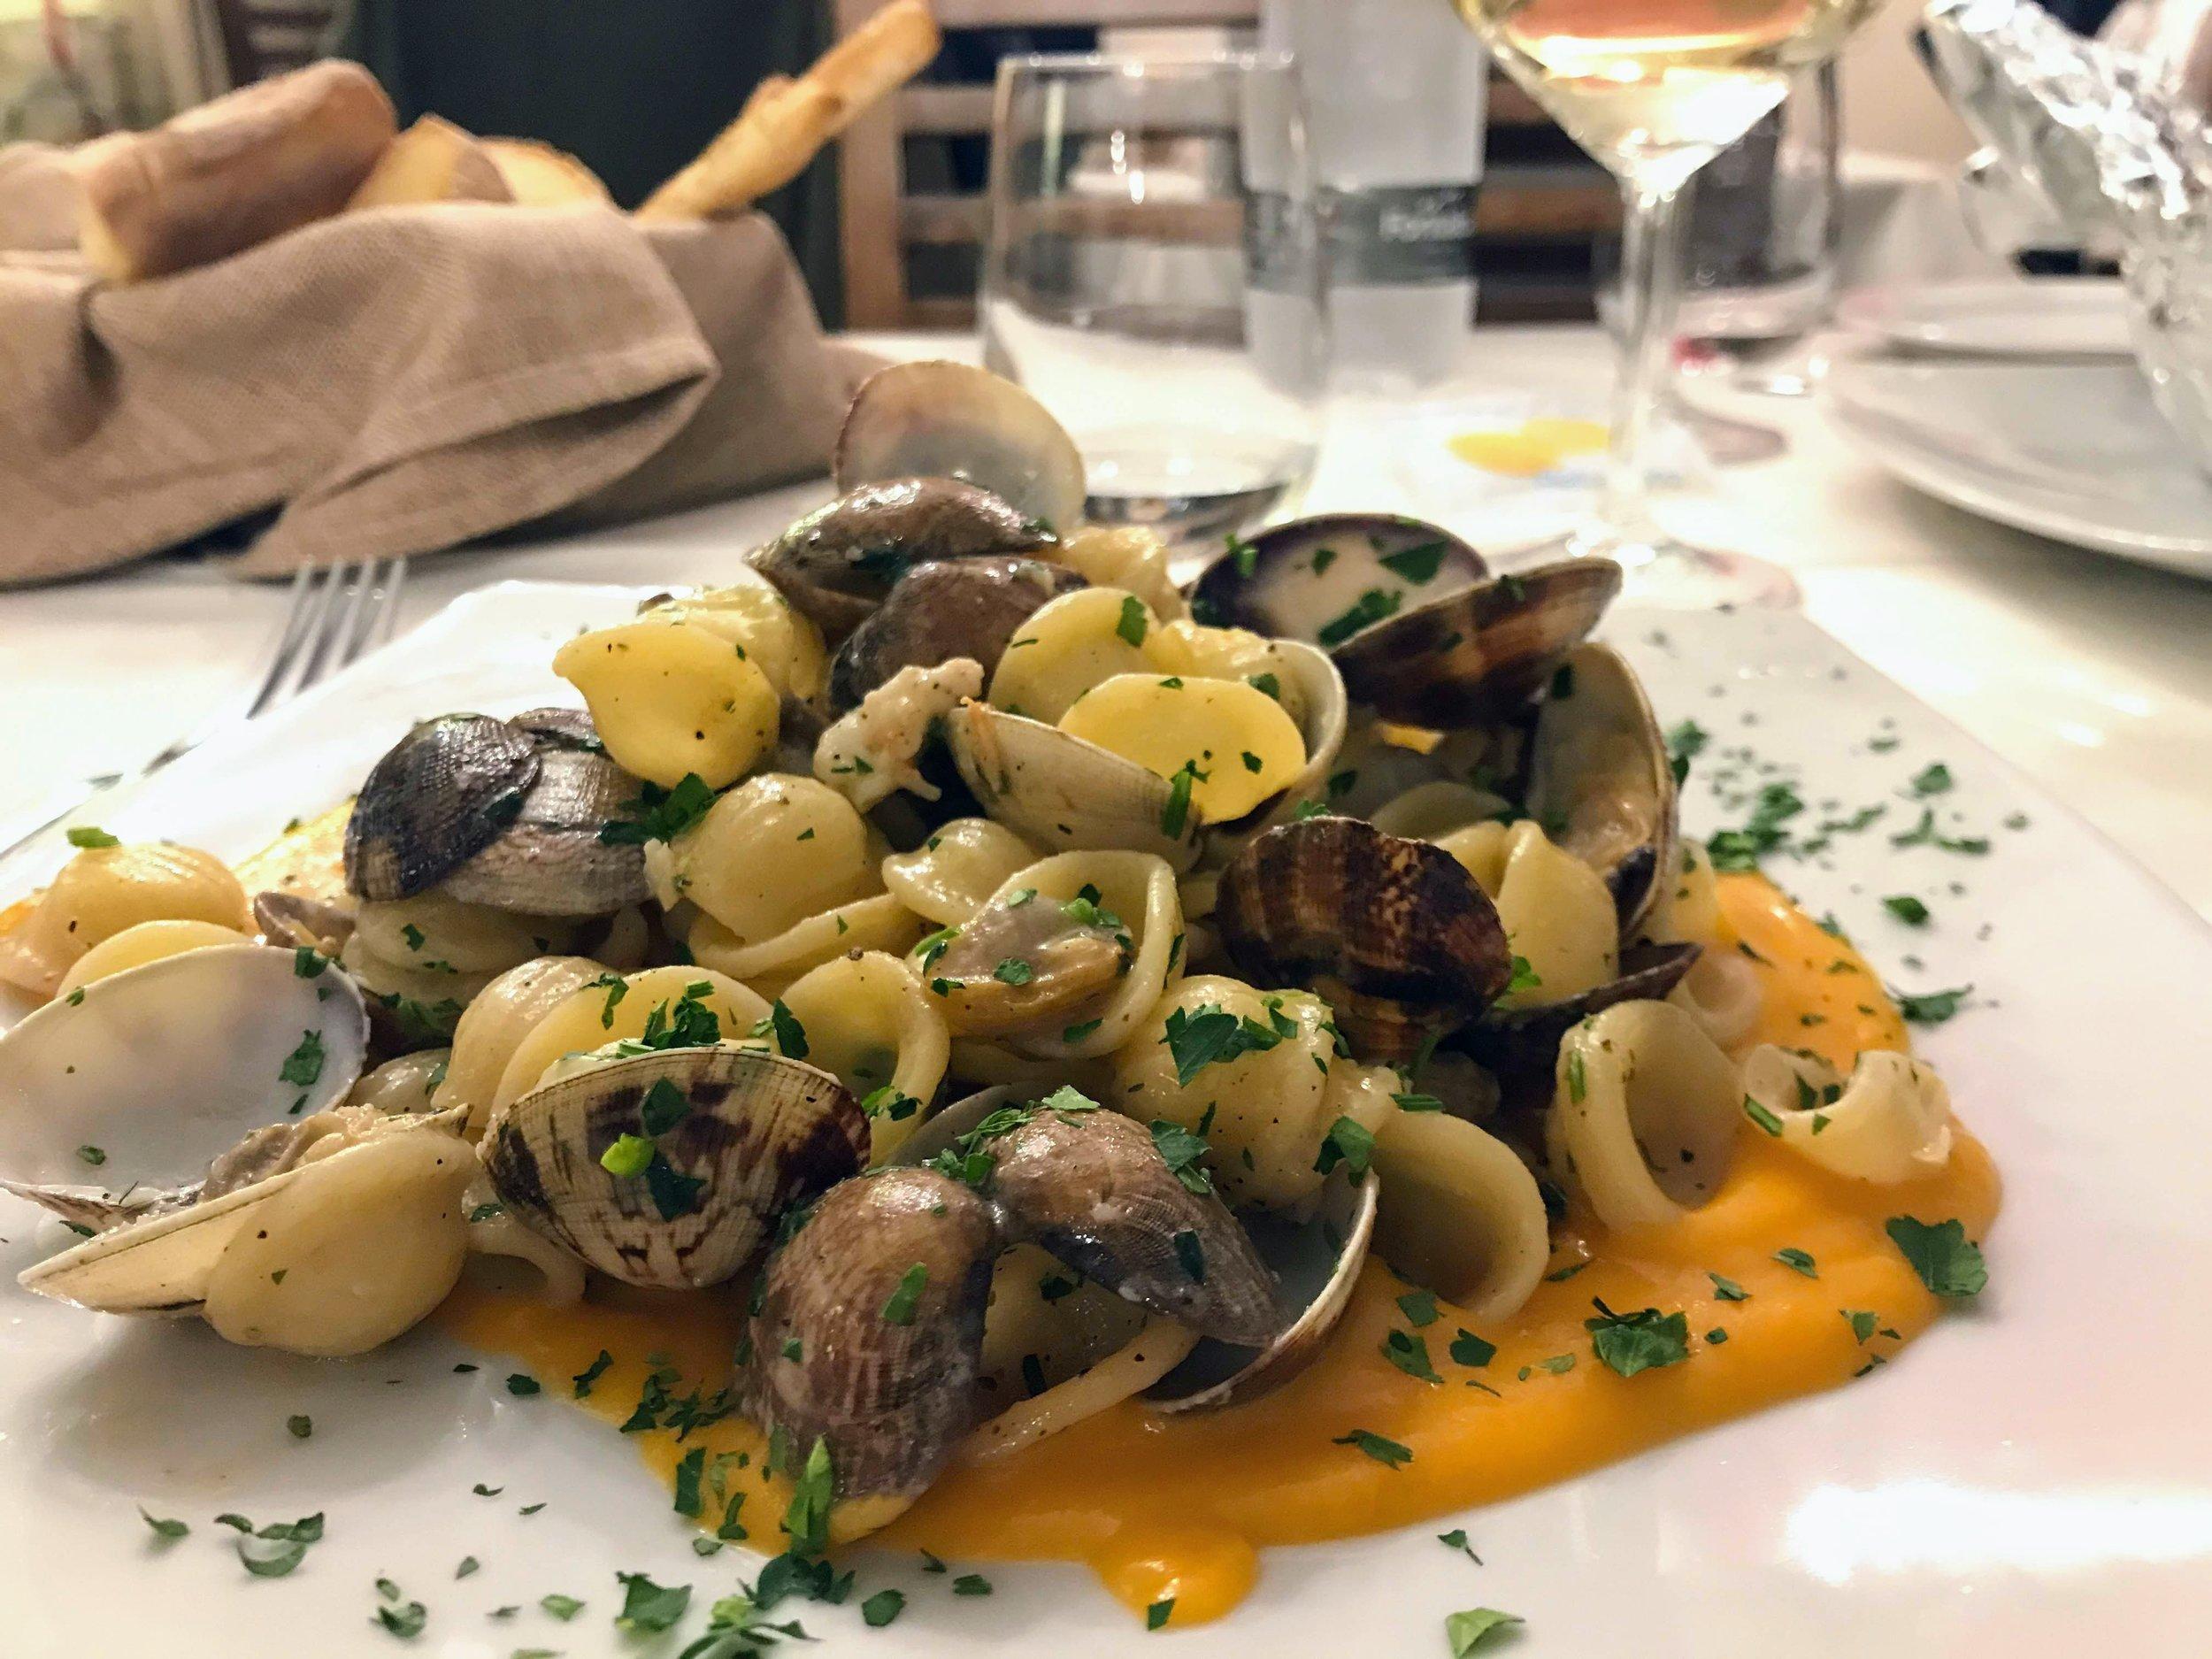 Seafood pasta from Trattoria da Antonio in Catania Sicily.JPG